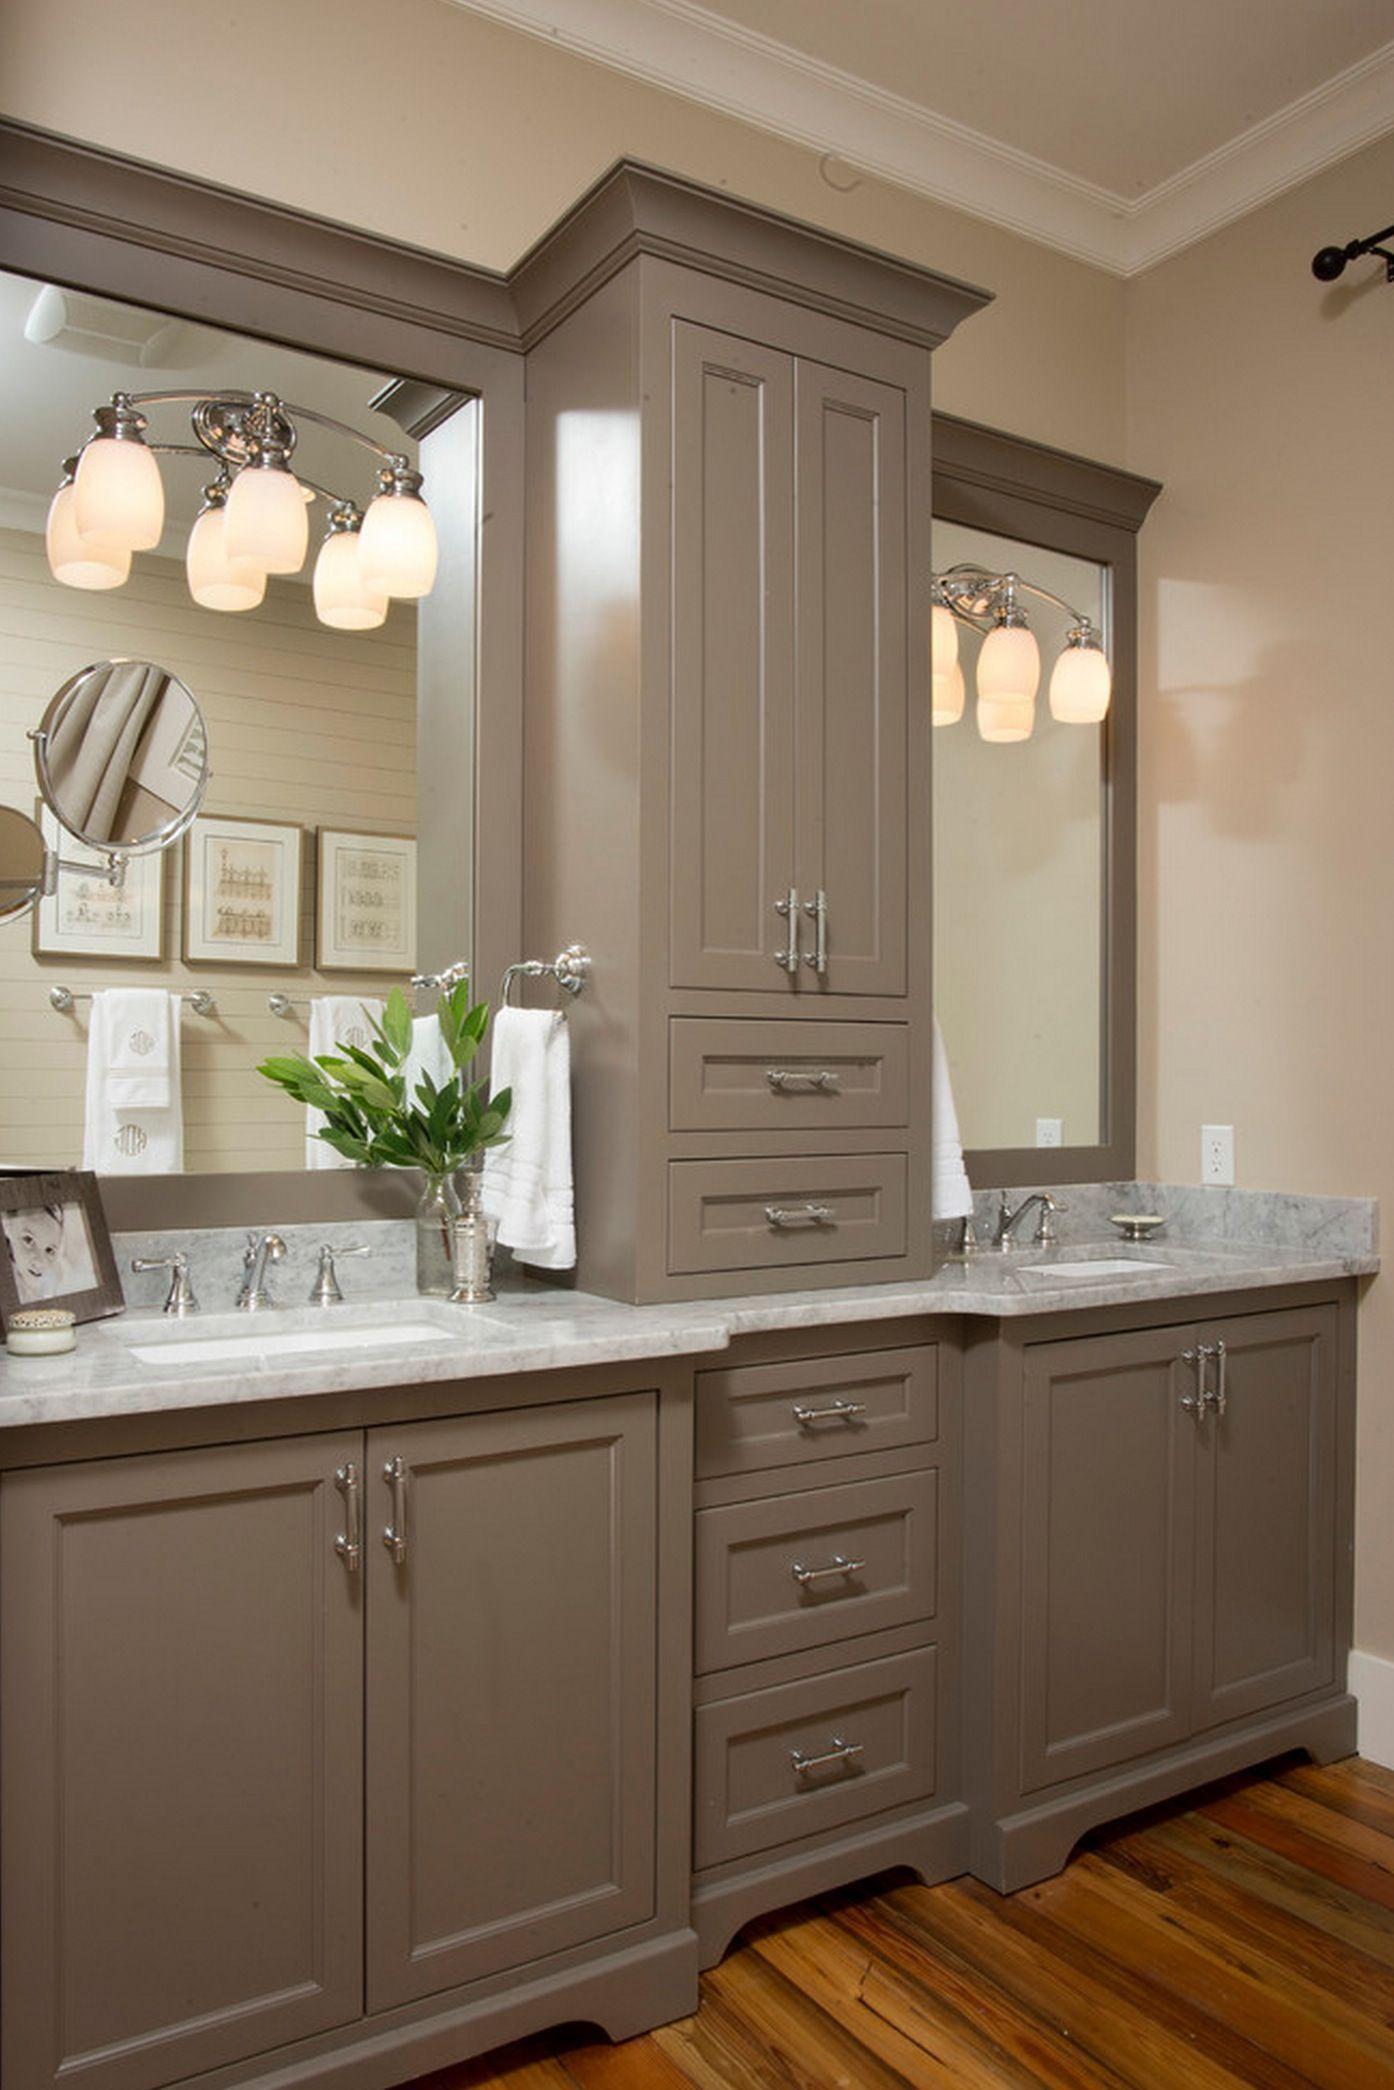 Bathroom Cabinet Ideas Before And After, Bathroom Cabinets Diy, Bathroom